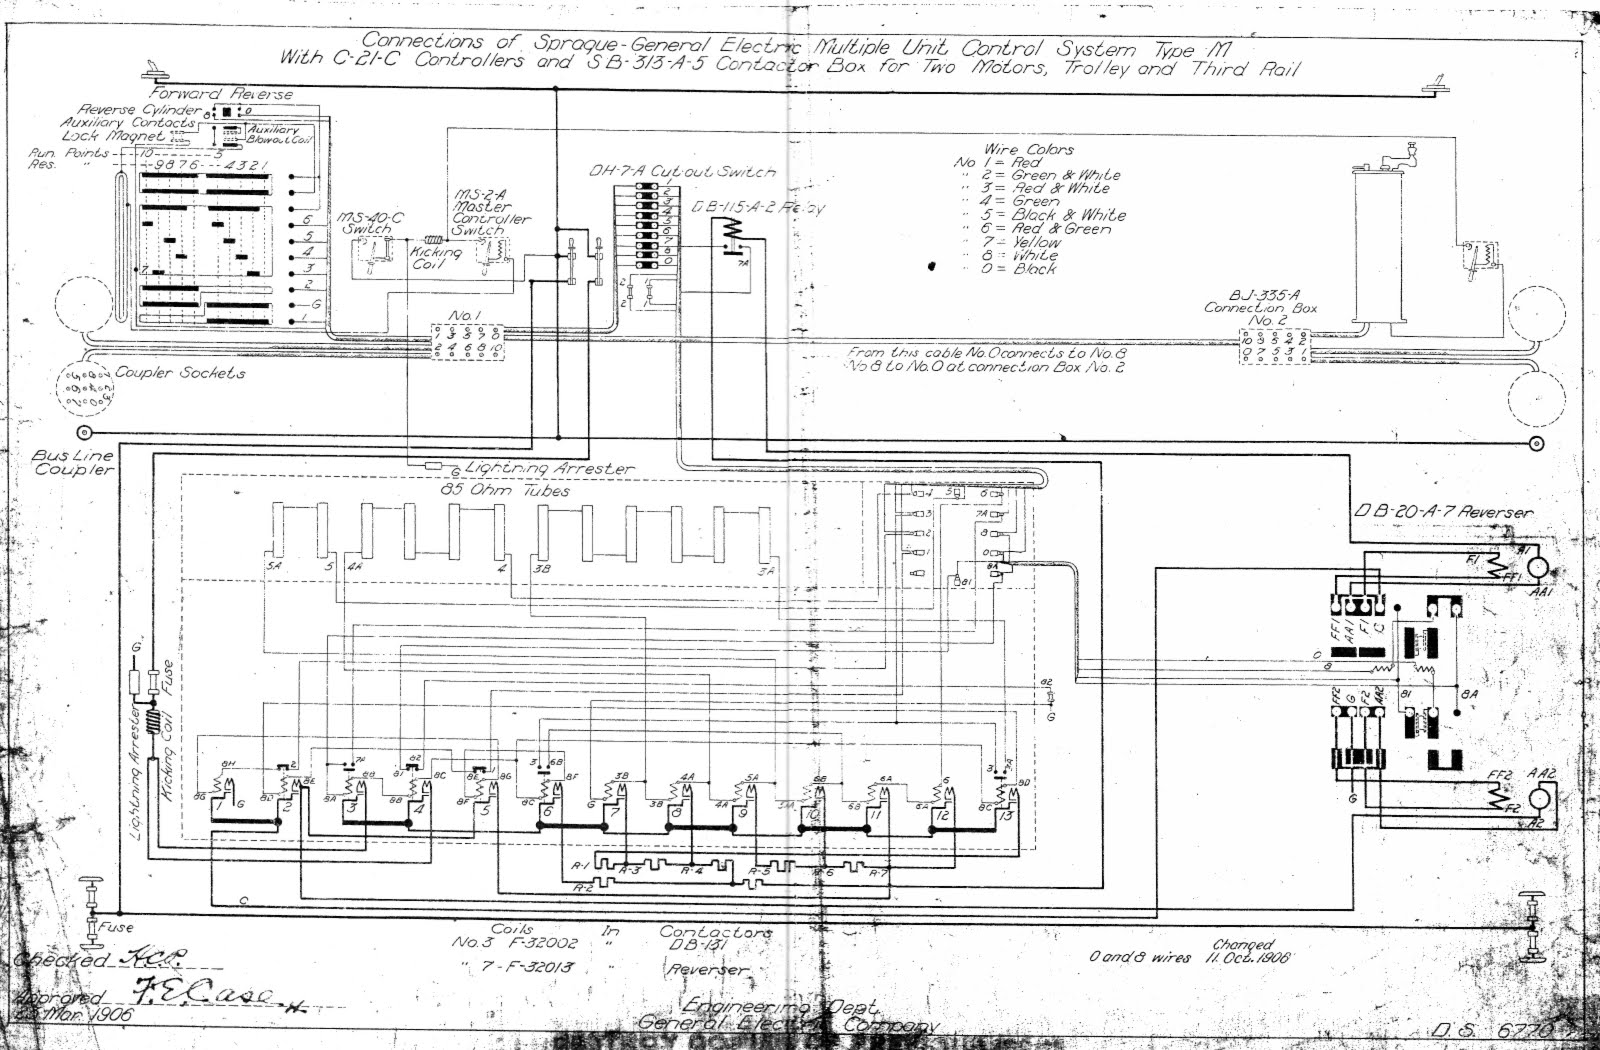 Murray Pm220as Fuse Box Wiring Diagram Libraries Breaker Moreover 200 Main Circuit Old Libraryenchanting Fiat Punto 1994 Nissan Titan And Relay